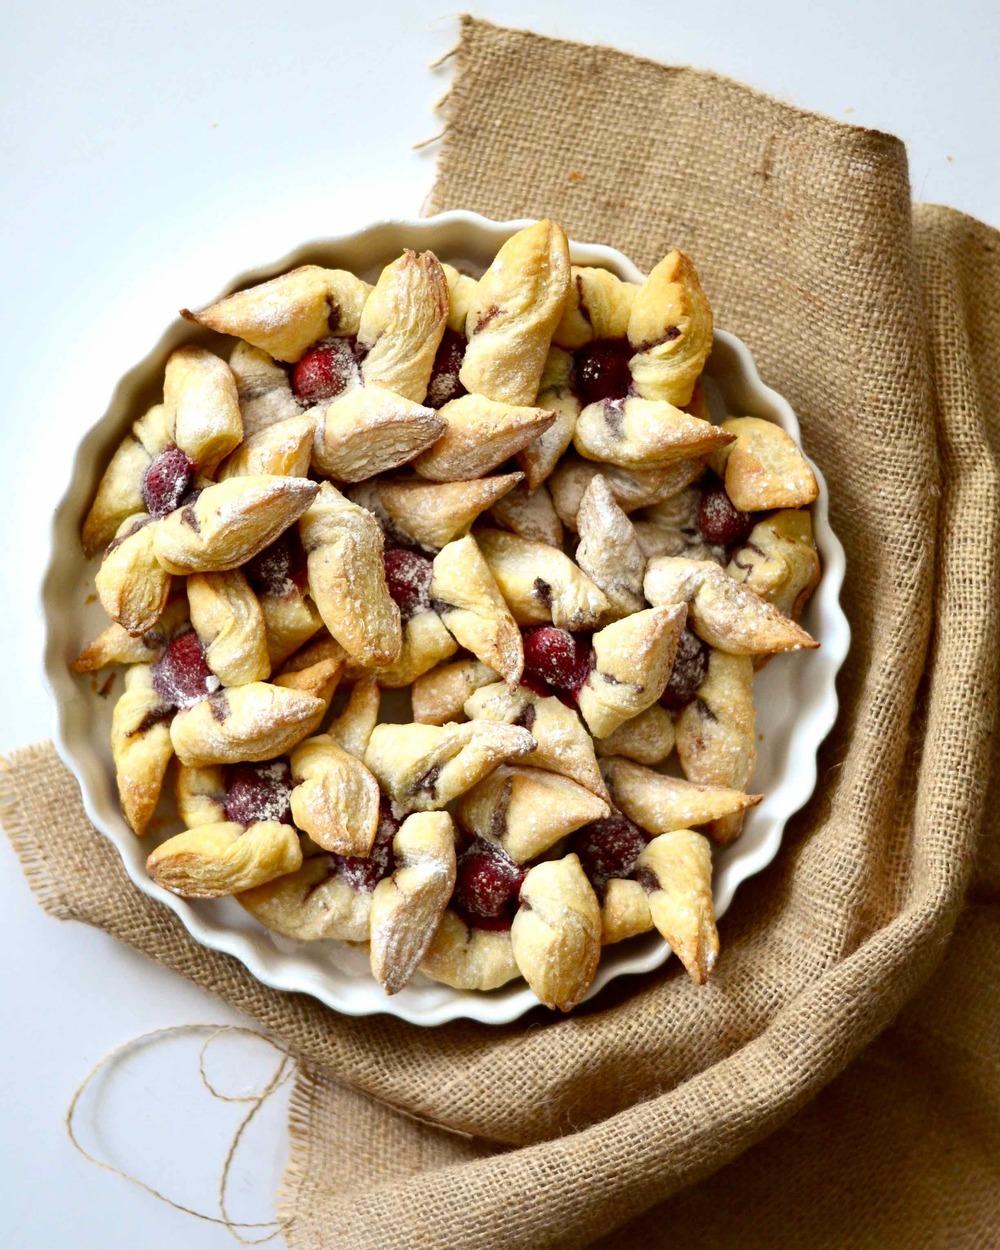 STRAWBERRY PINWHEELS WITH A CHOCOLATE-HAZELNUT SURPRISE